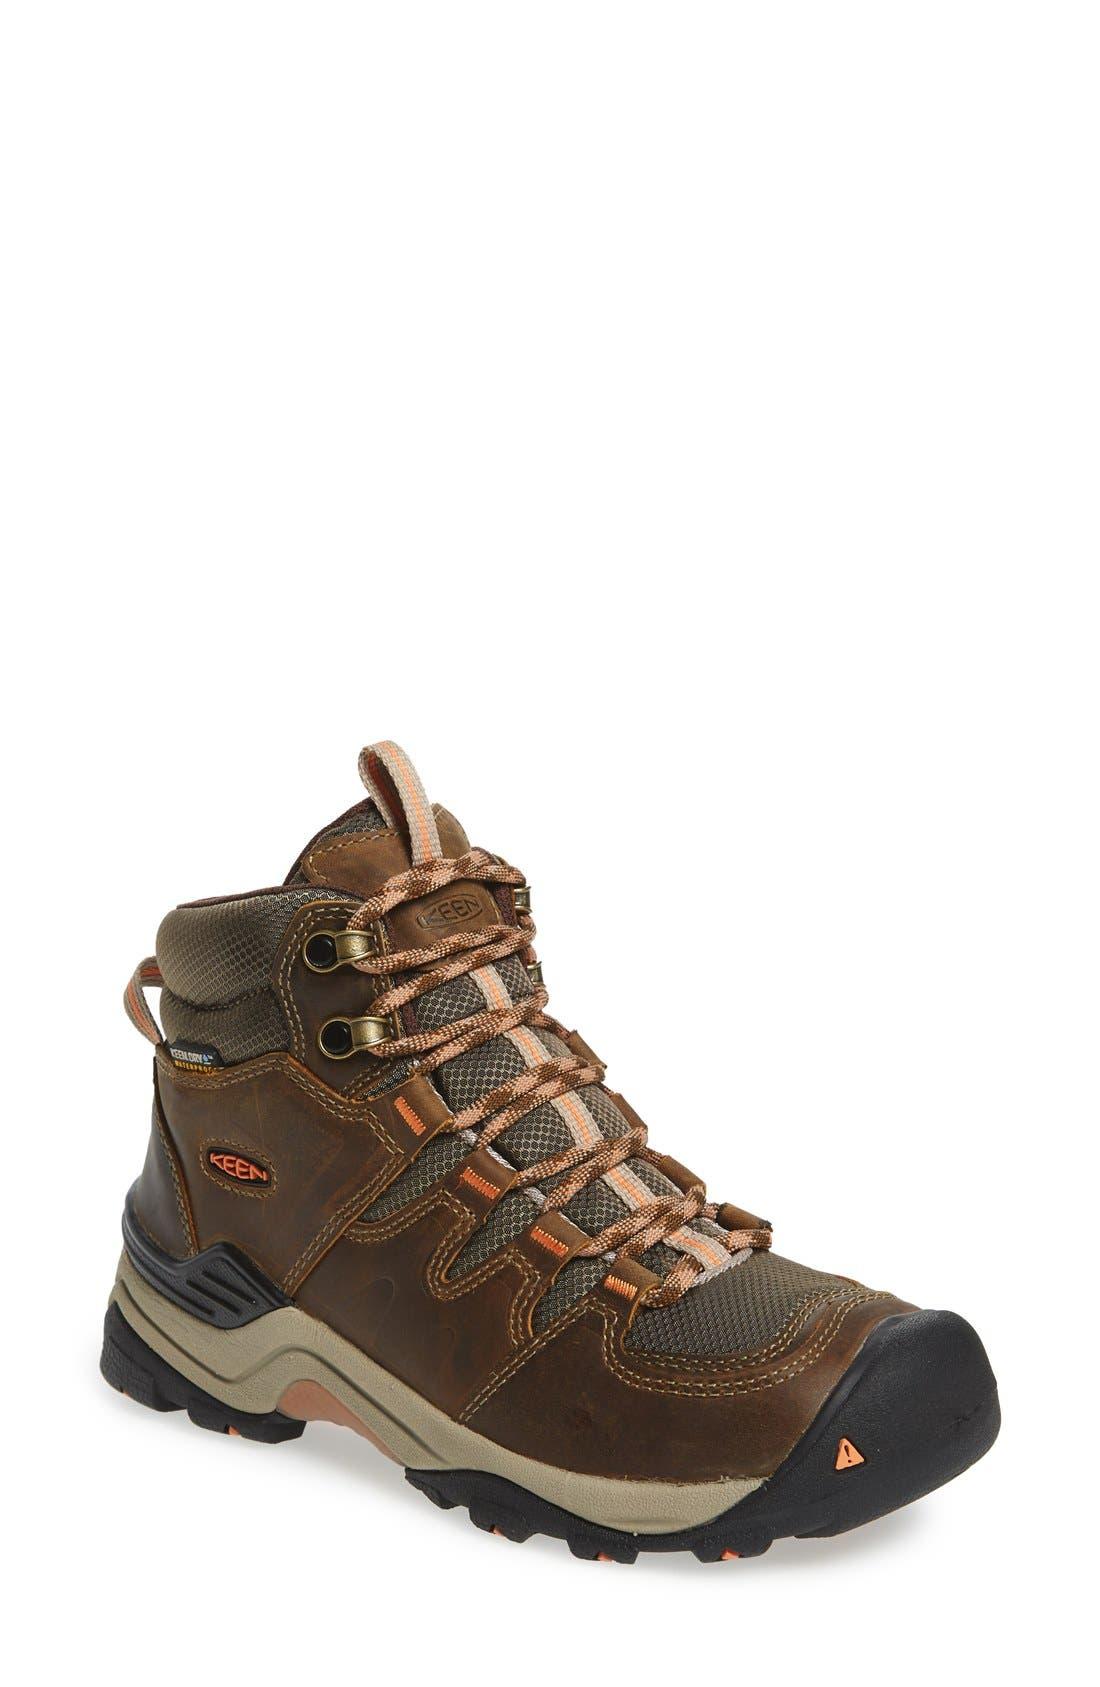 Gypsum II Mid Waterproof Hiking Boot,                         Main,                         color, CORNSTOCK/ GOLD CORAL